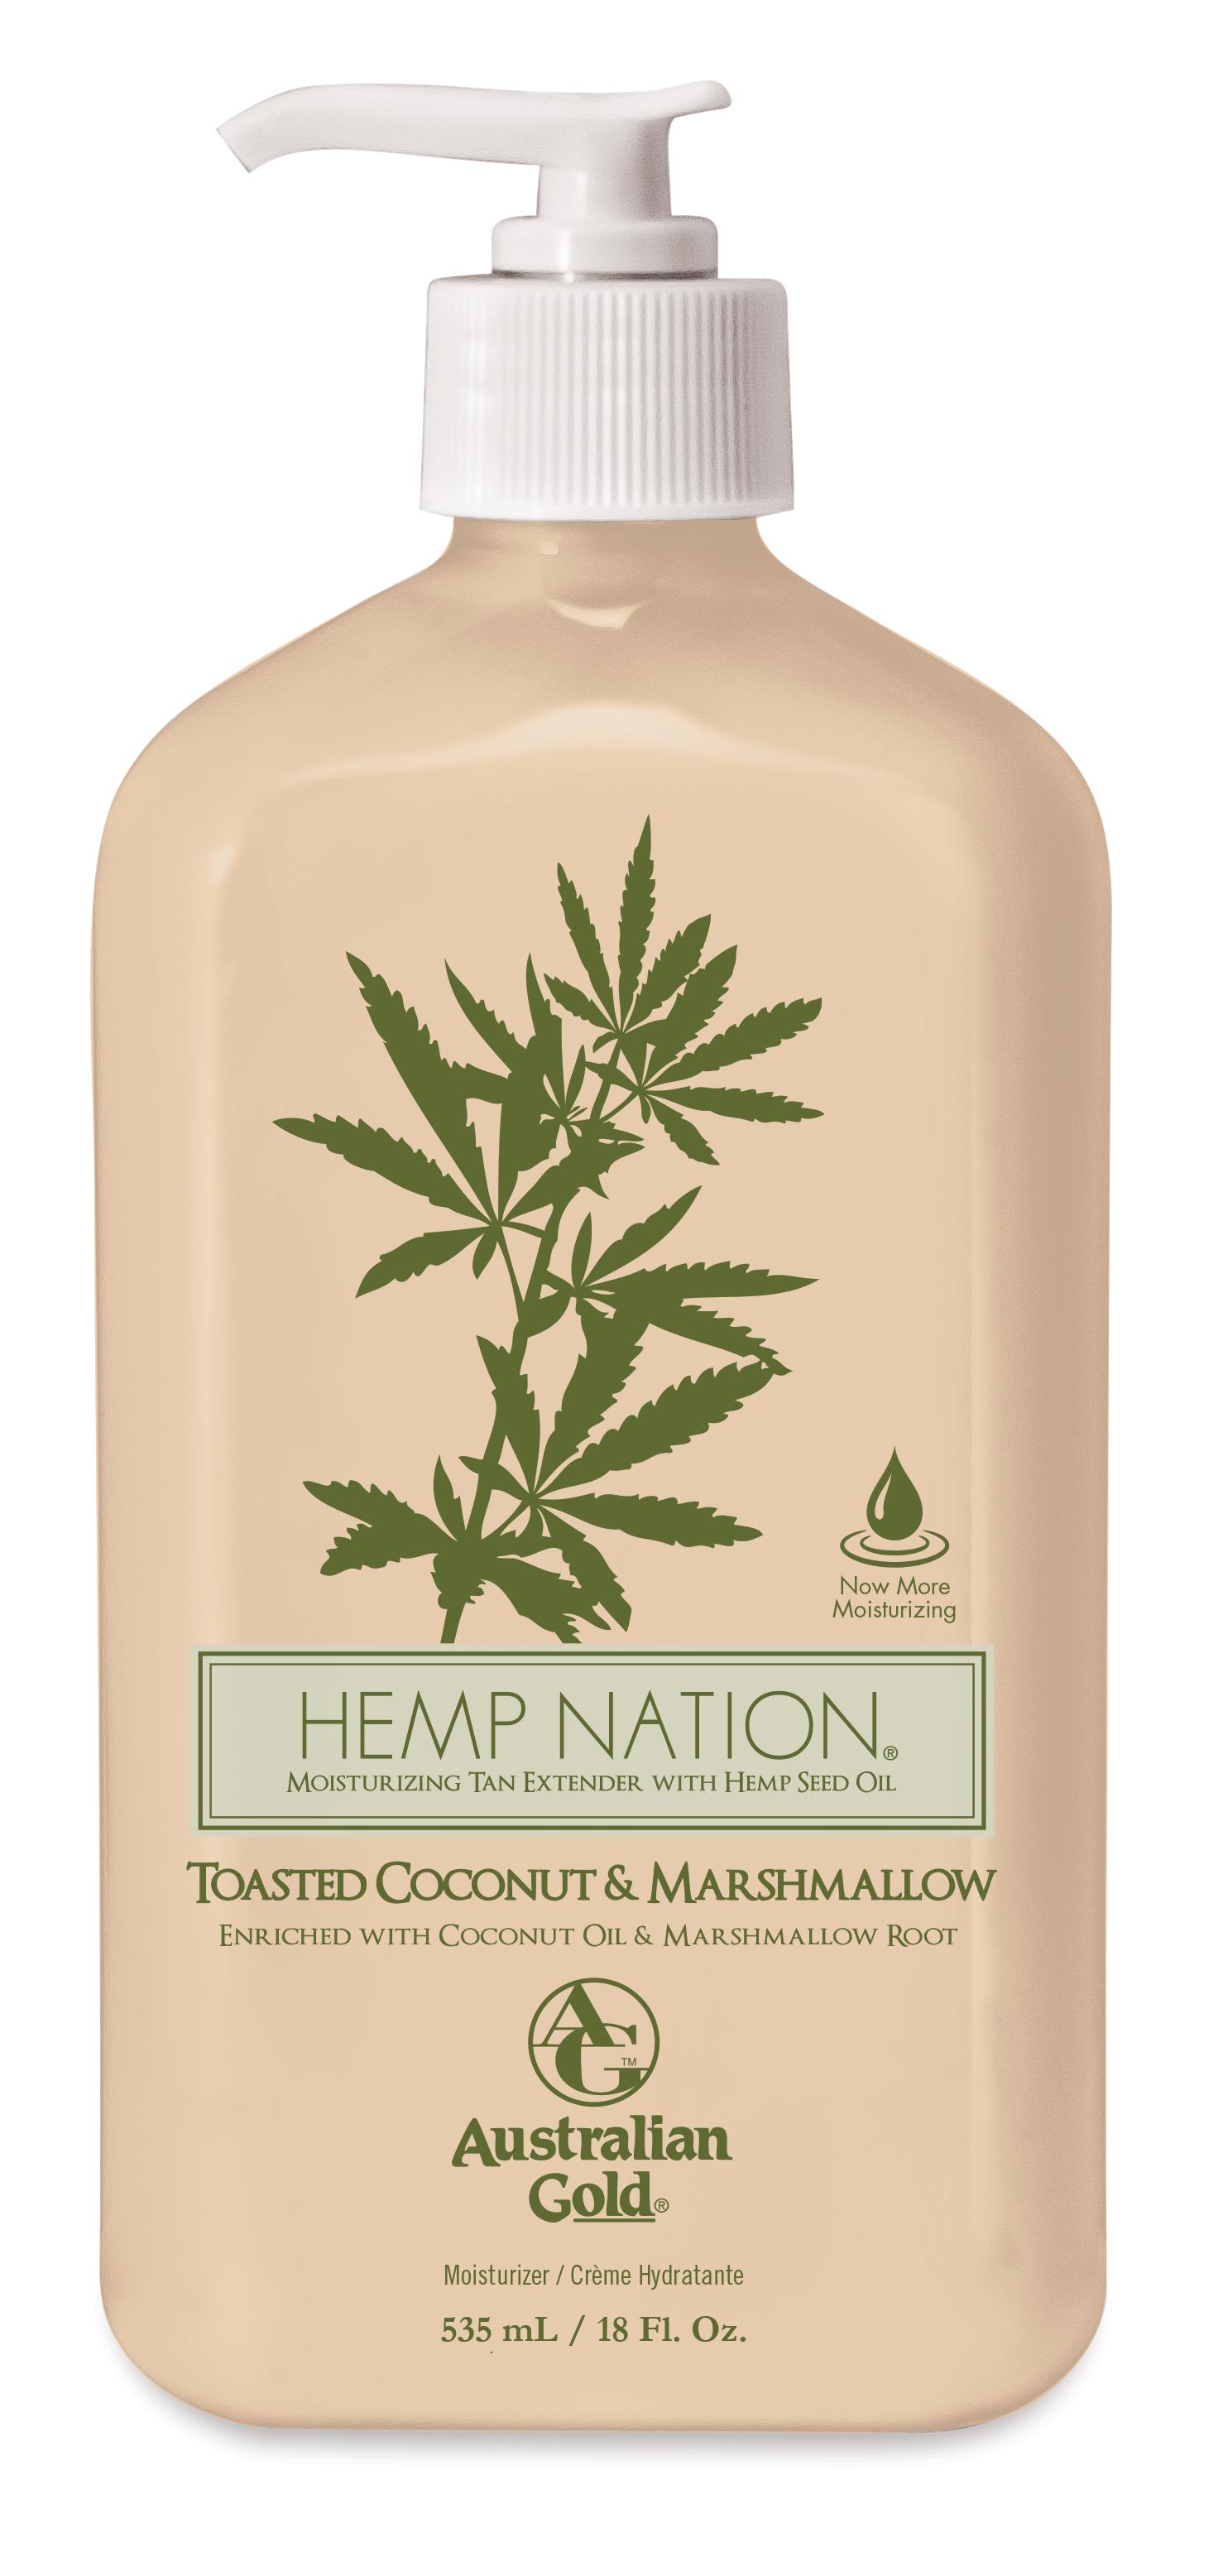 Hemp Nation - Toasted Coconut & Marshmallow - Tanning Creams